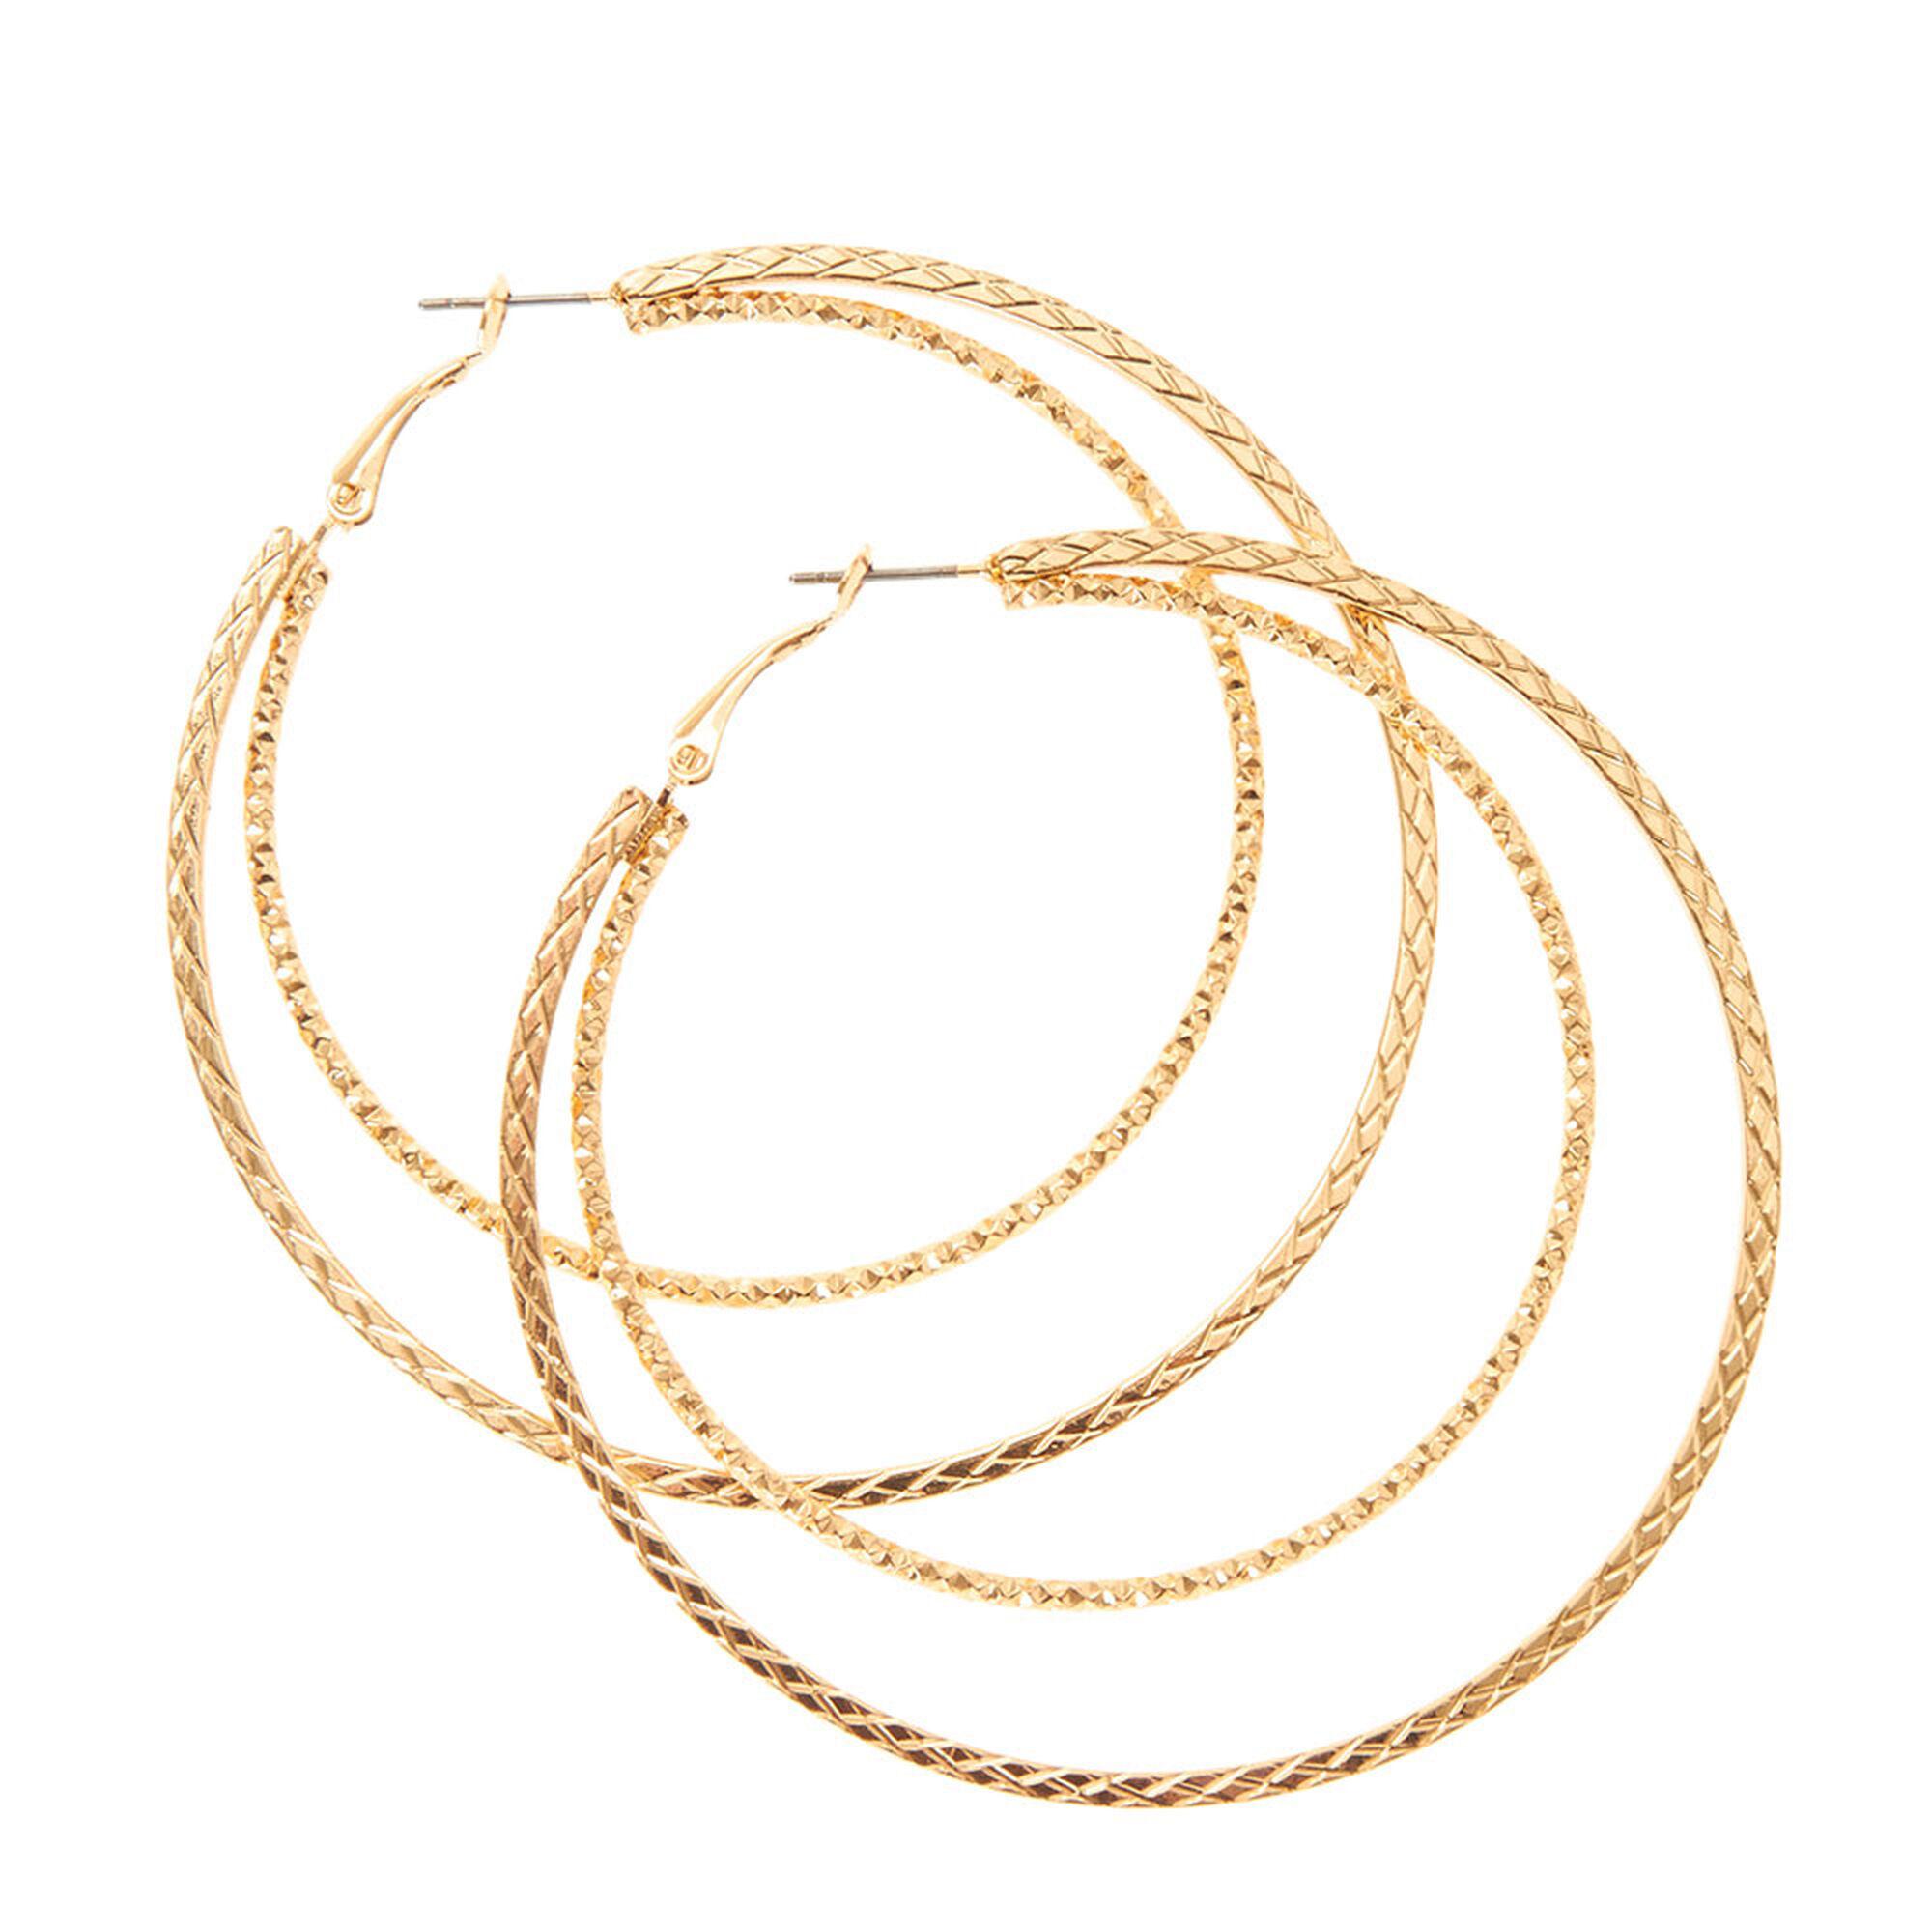 60mm Gold Textured Double Hoop Earrings